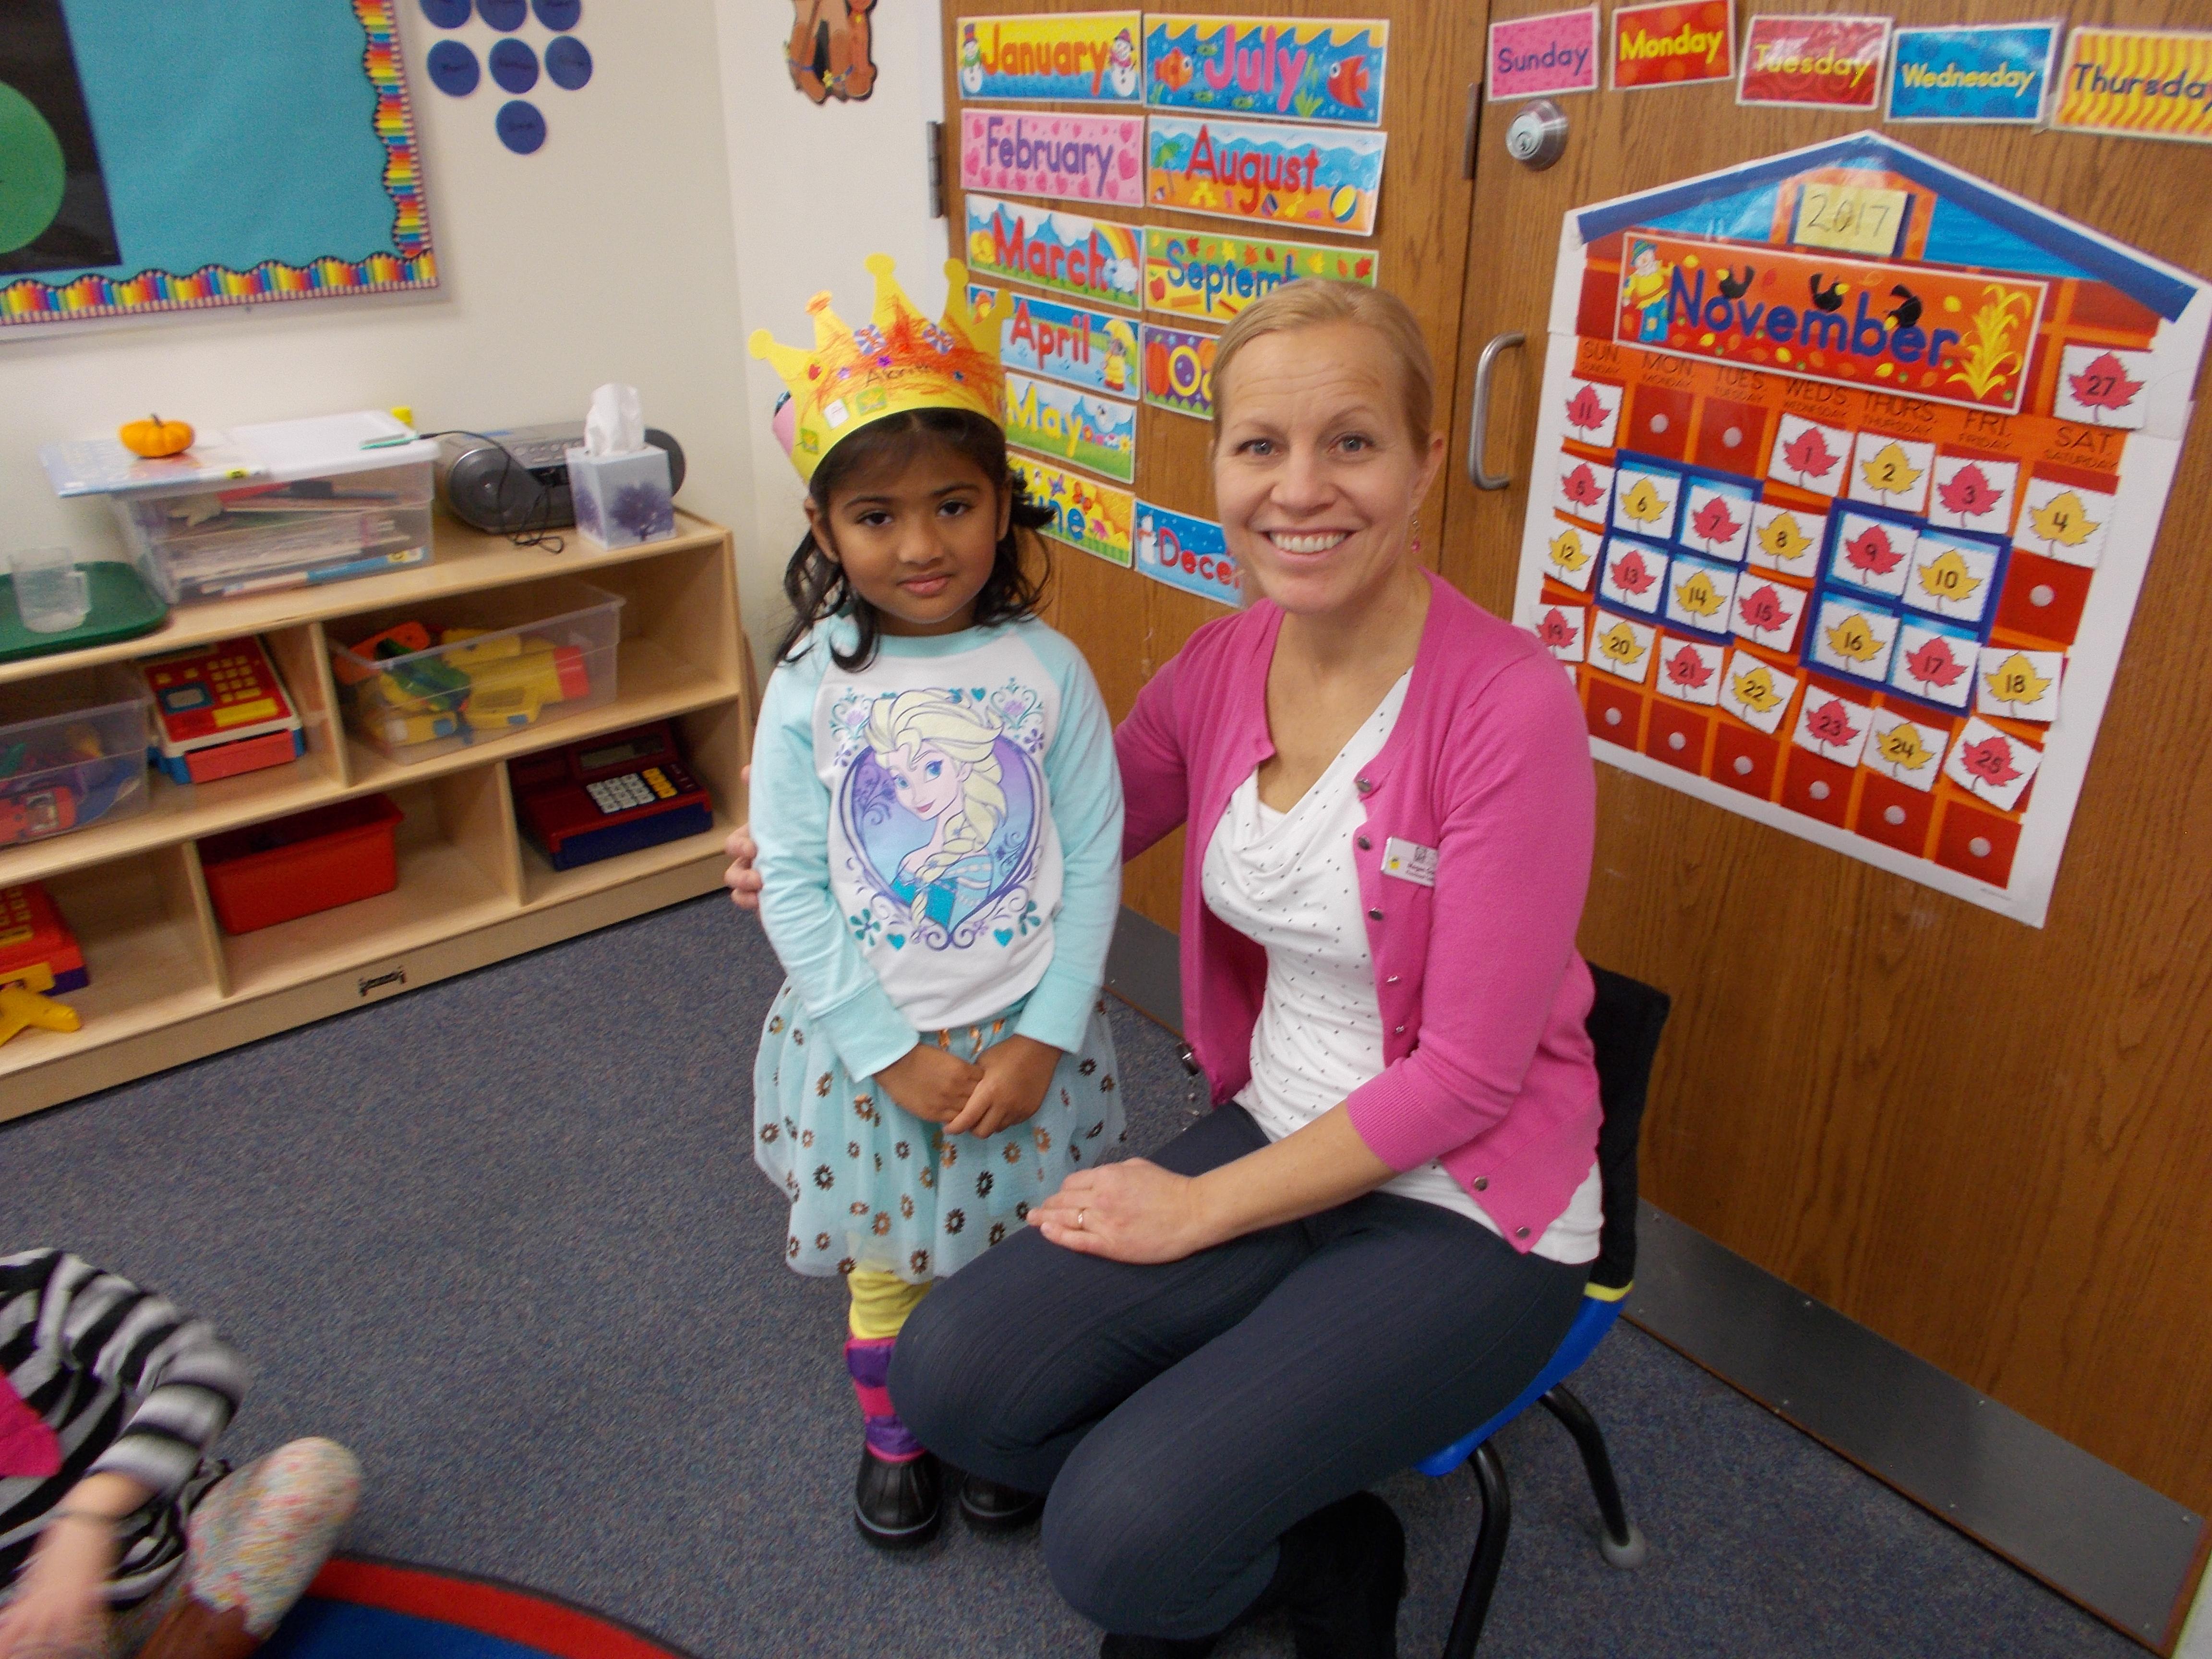 Growing Tree Preschool student with Ms. Megan.